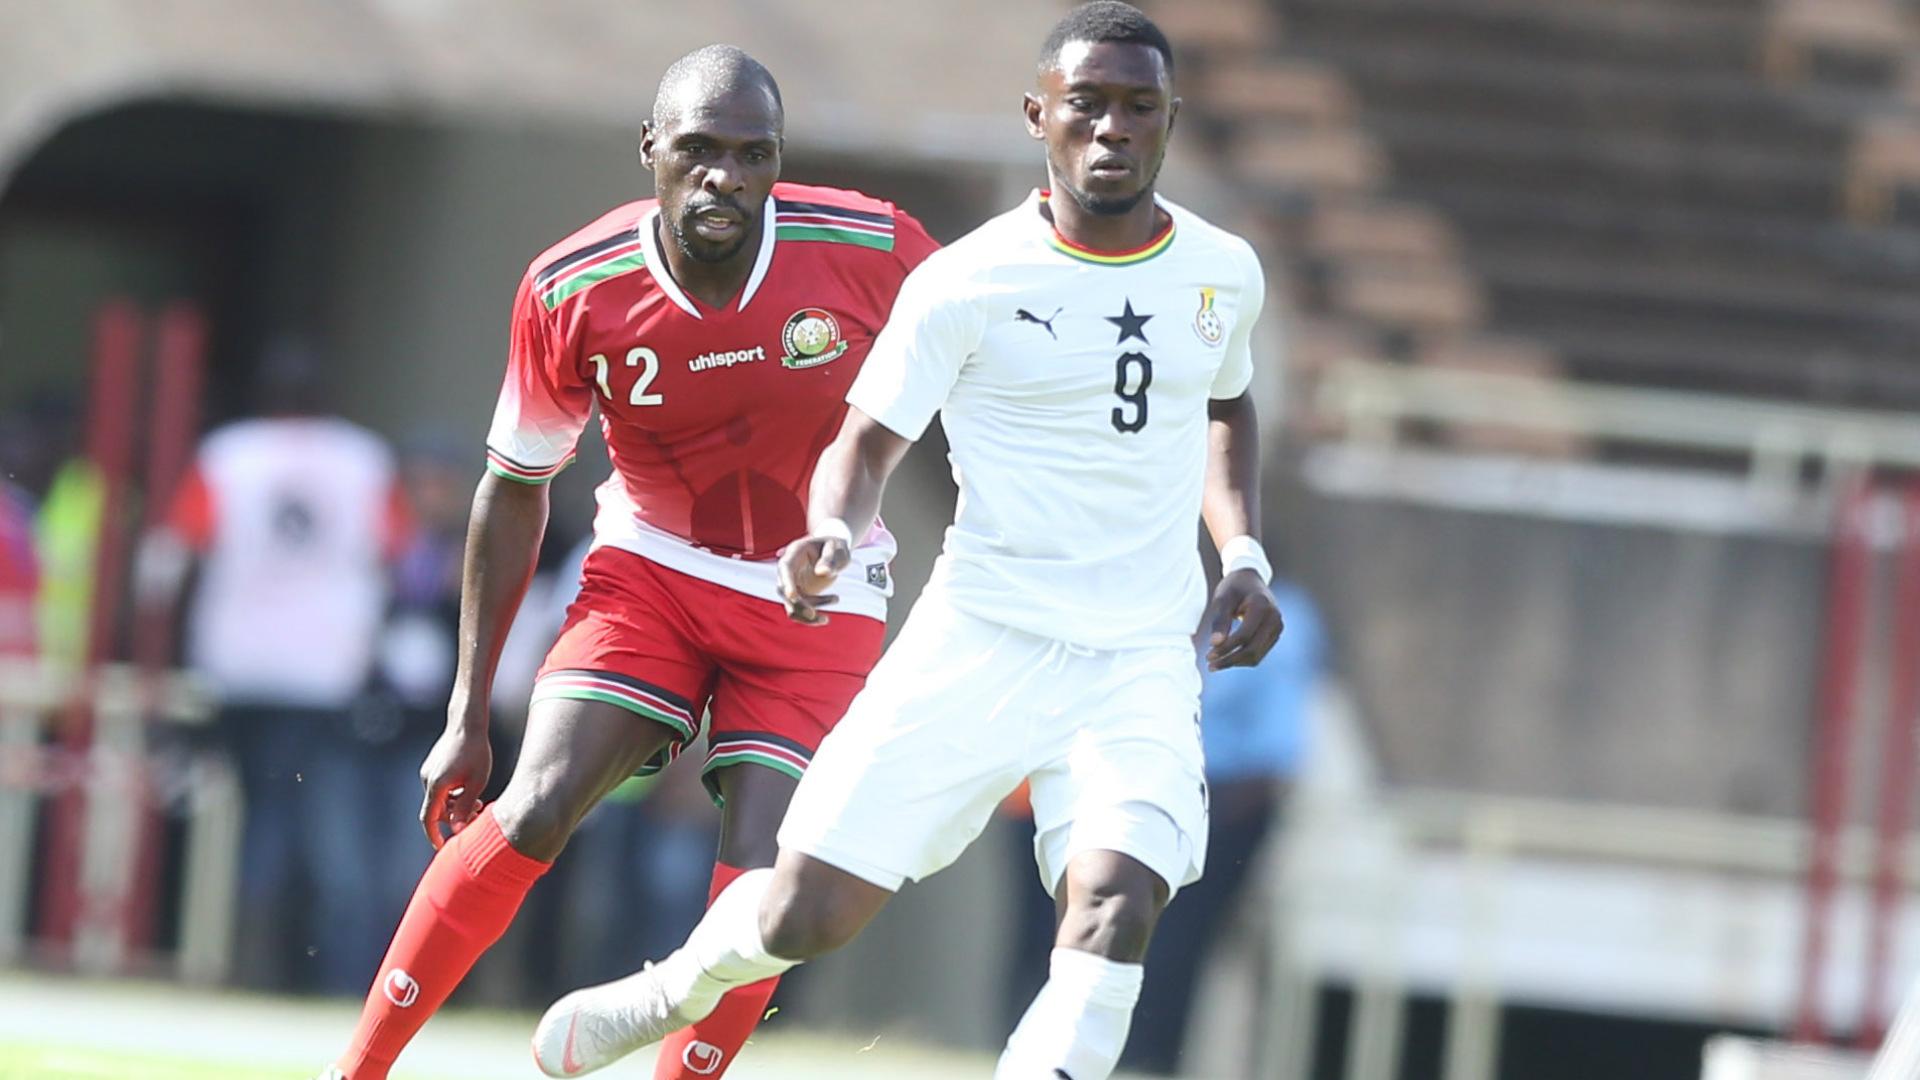 Image result for Joash Onyango Harambee Stars